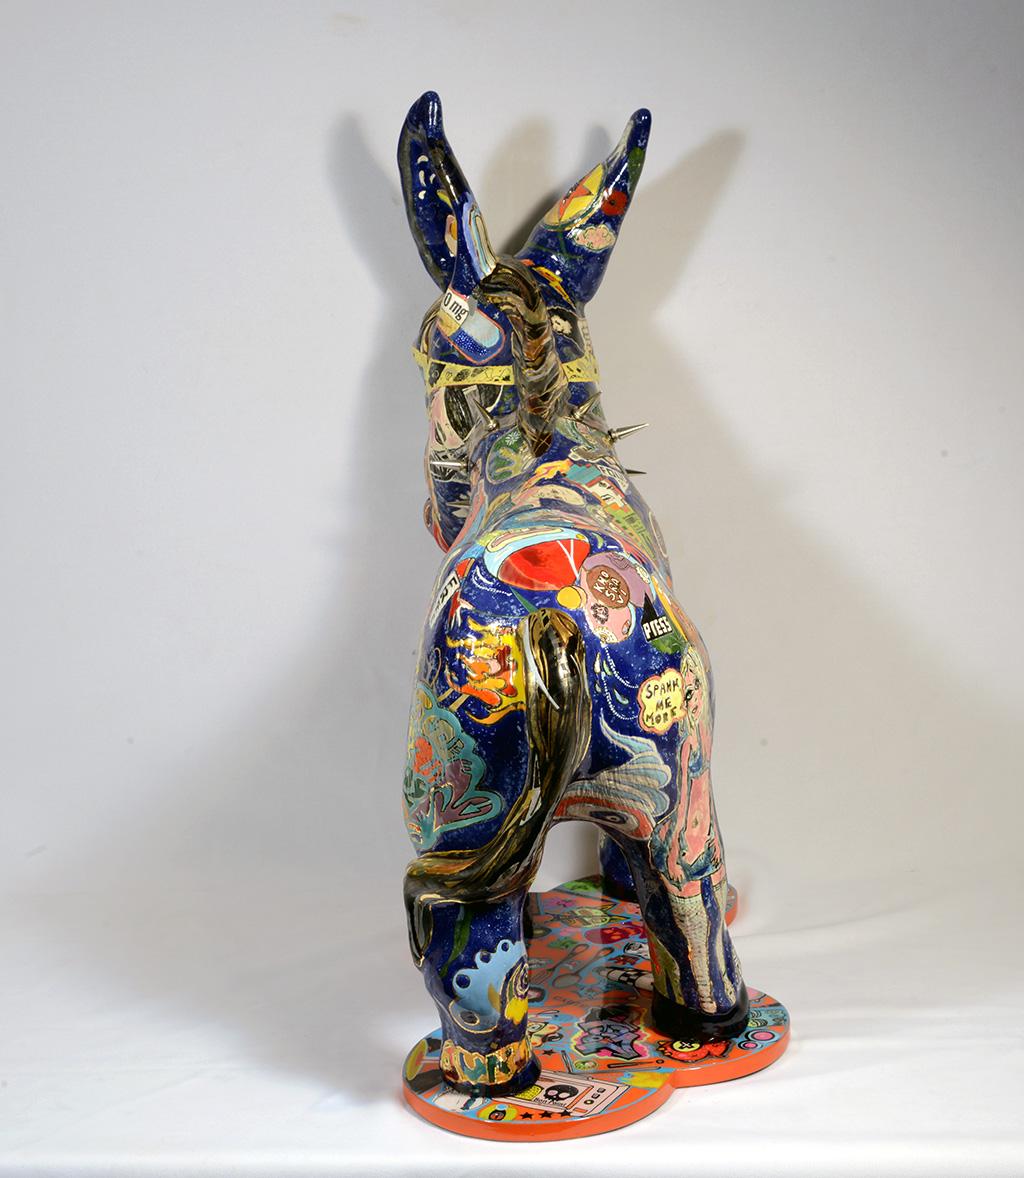 Sculpture_2015_Ane-Trotro_18.jpg